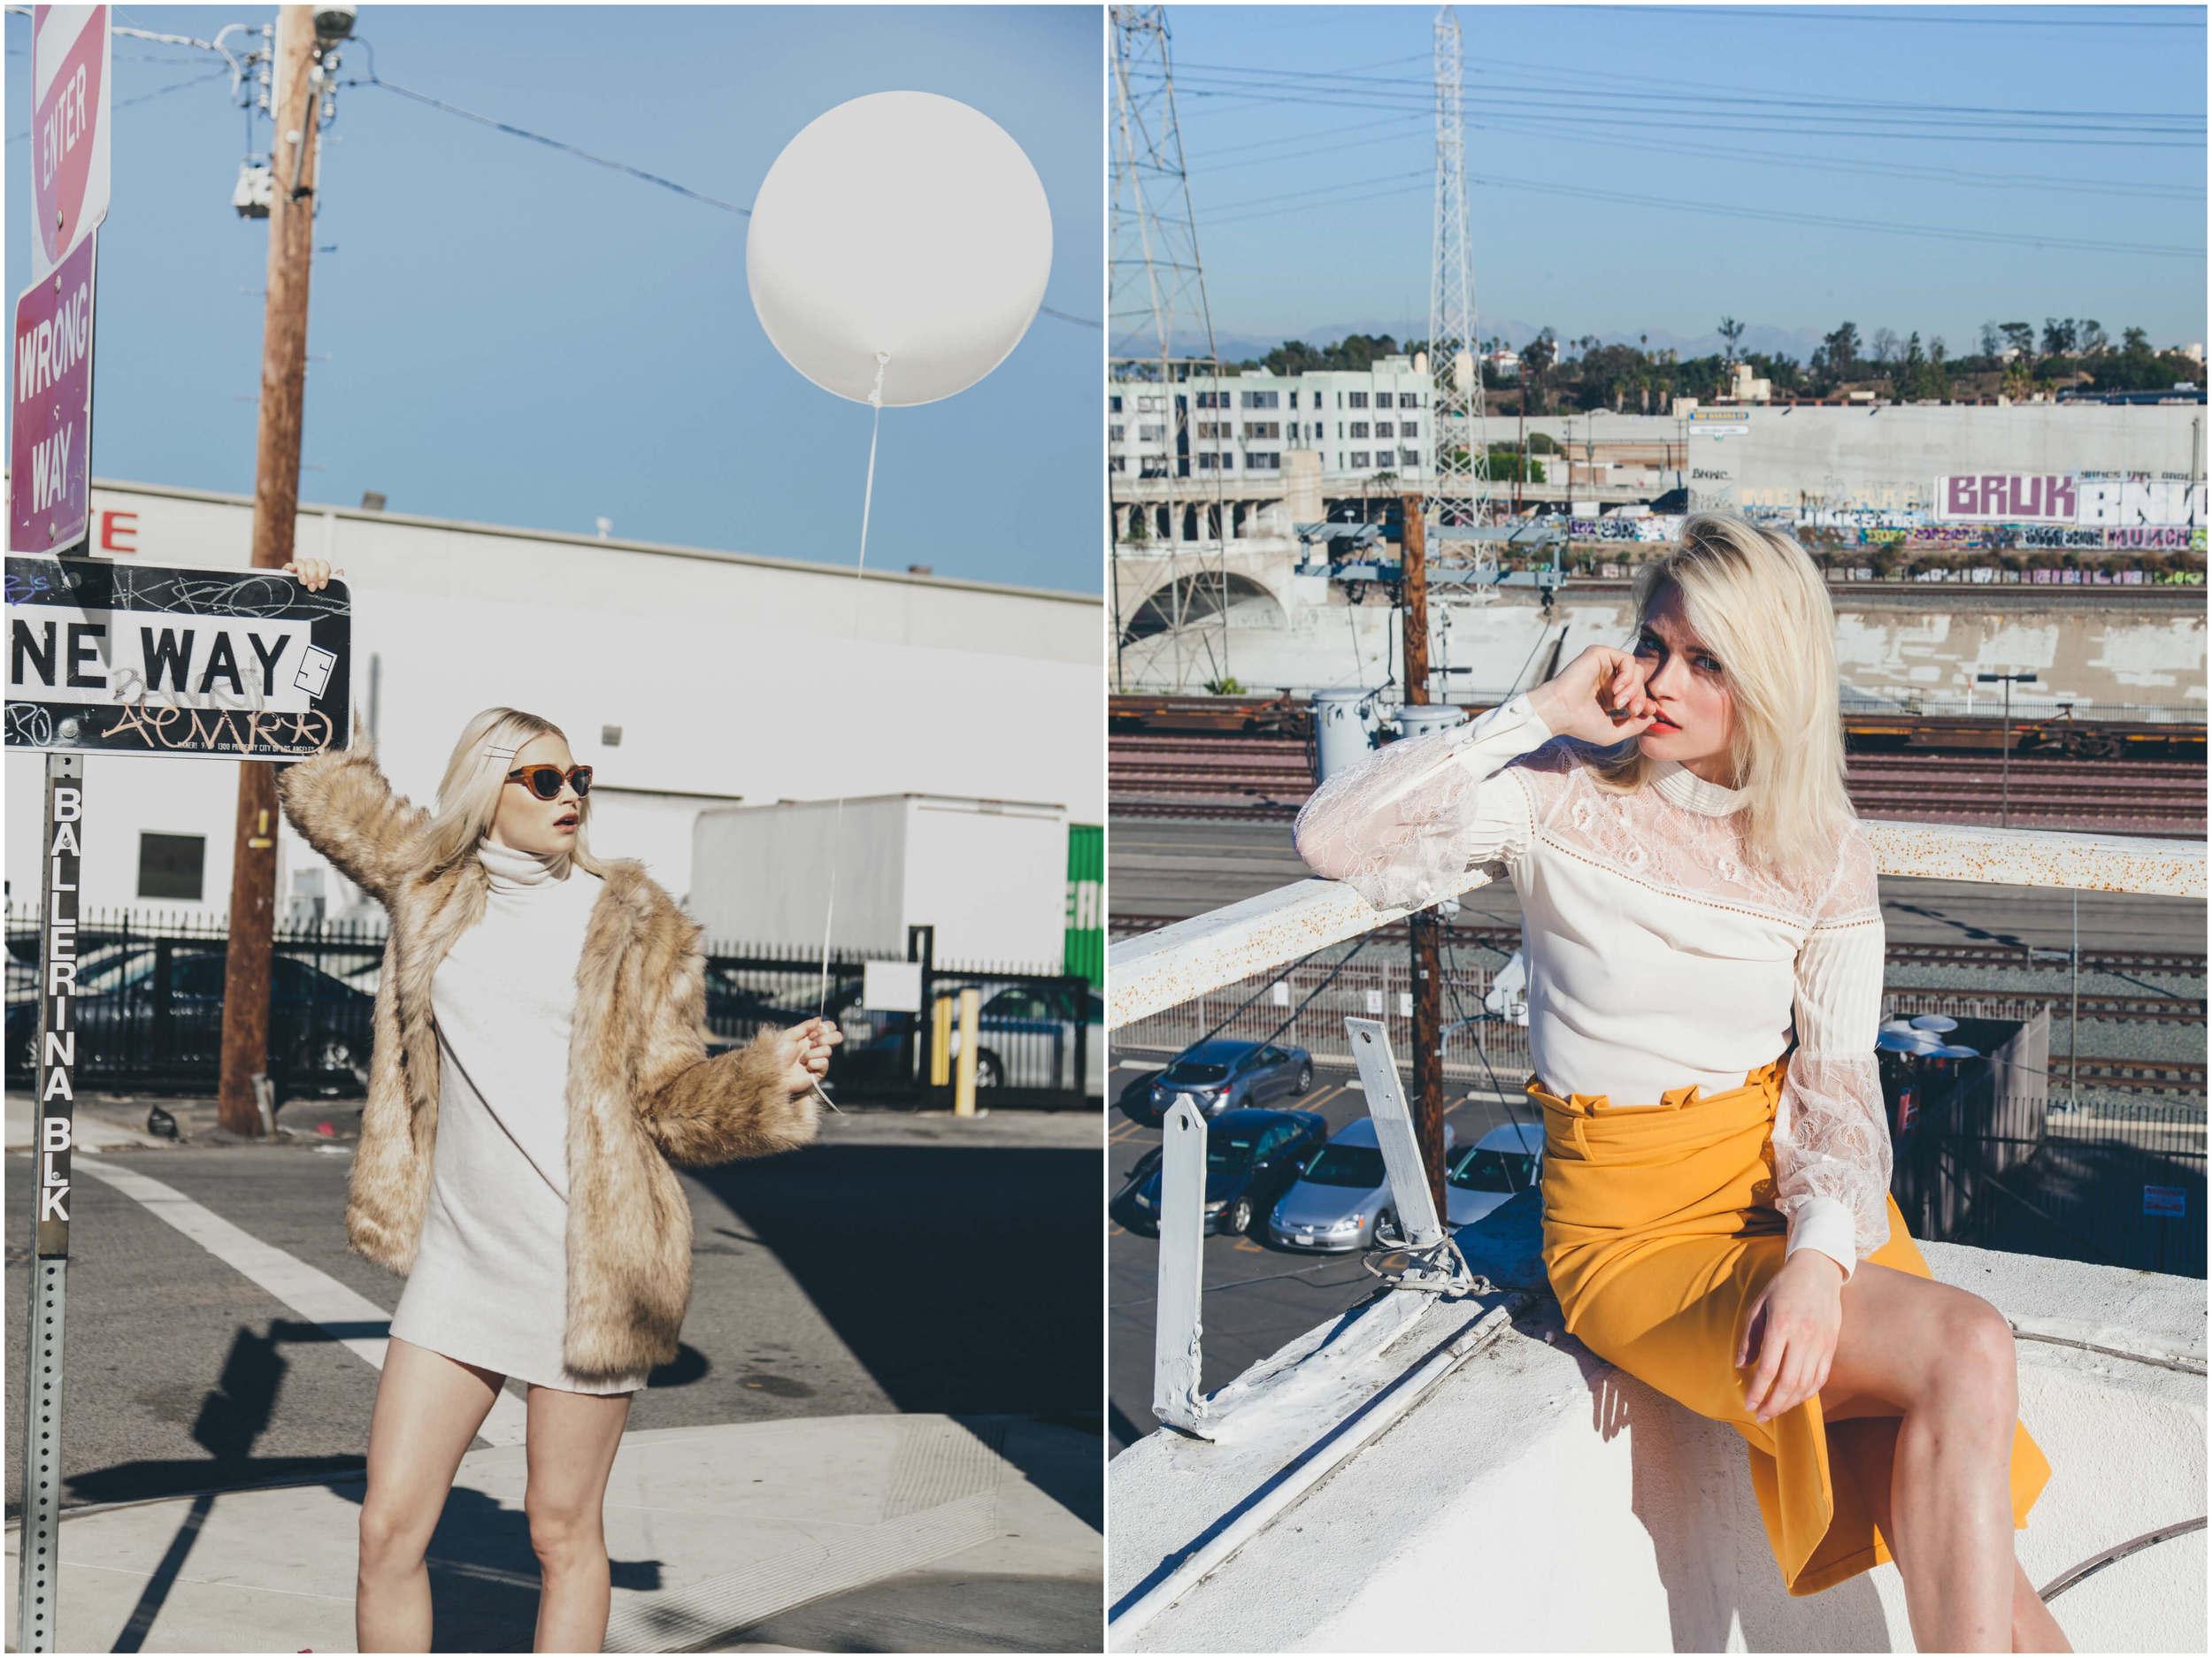 Celestine Collage 1.jpg